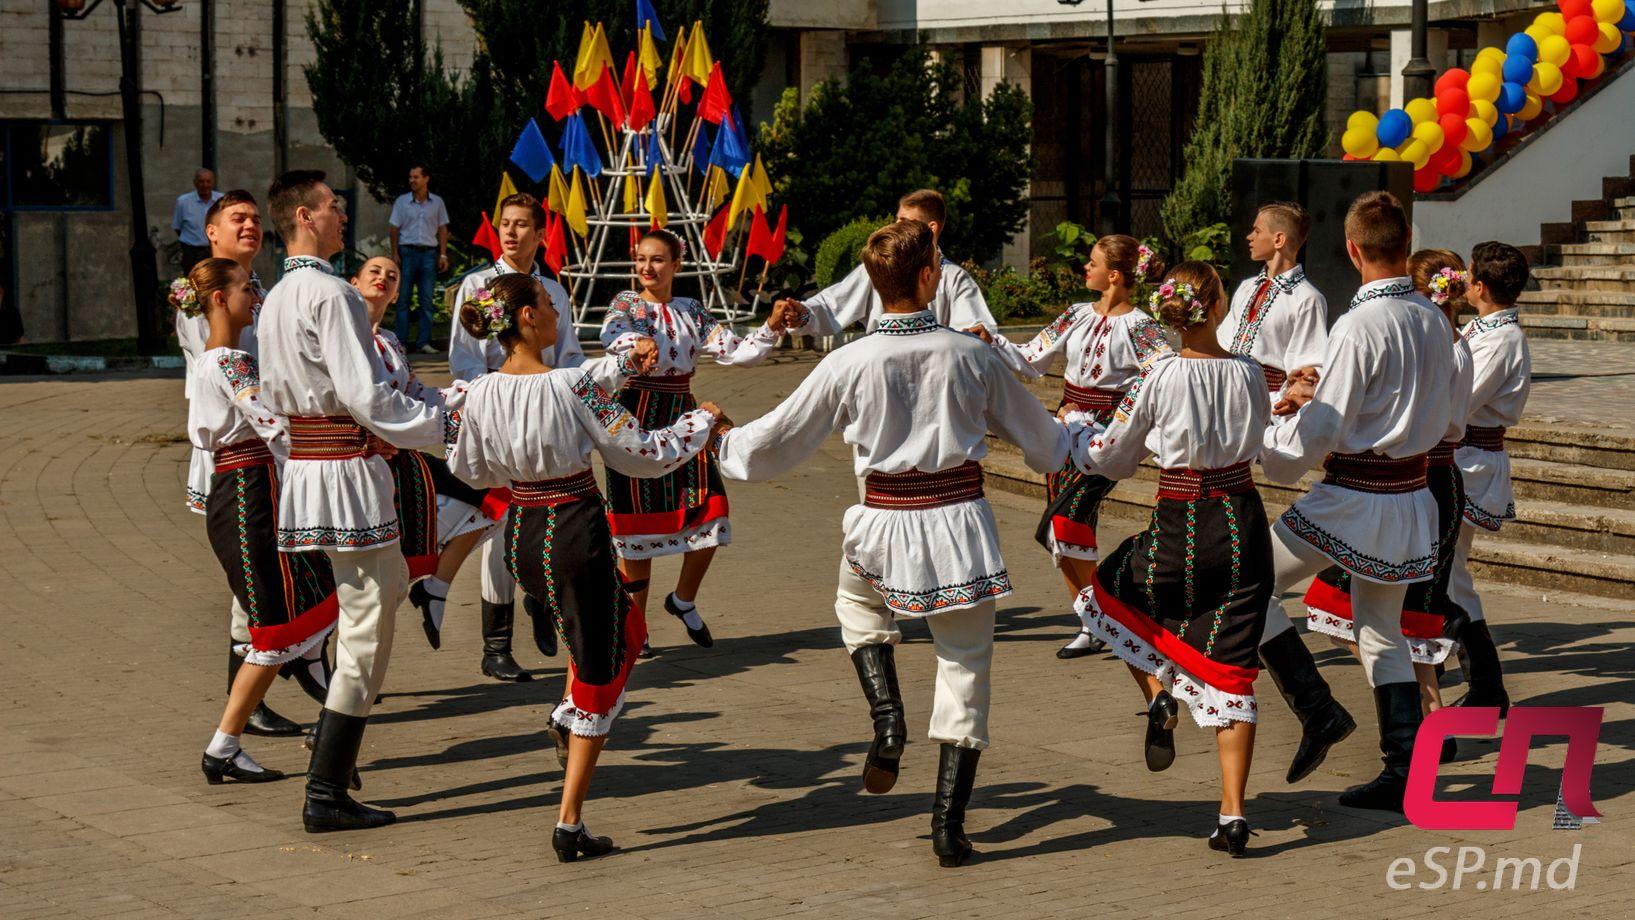 фасон поздравление от молдаванки декор поможет краска